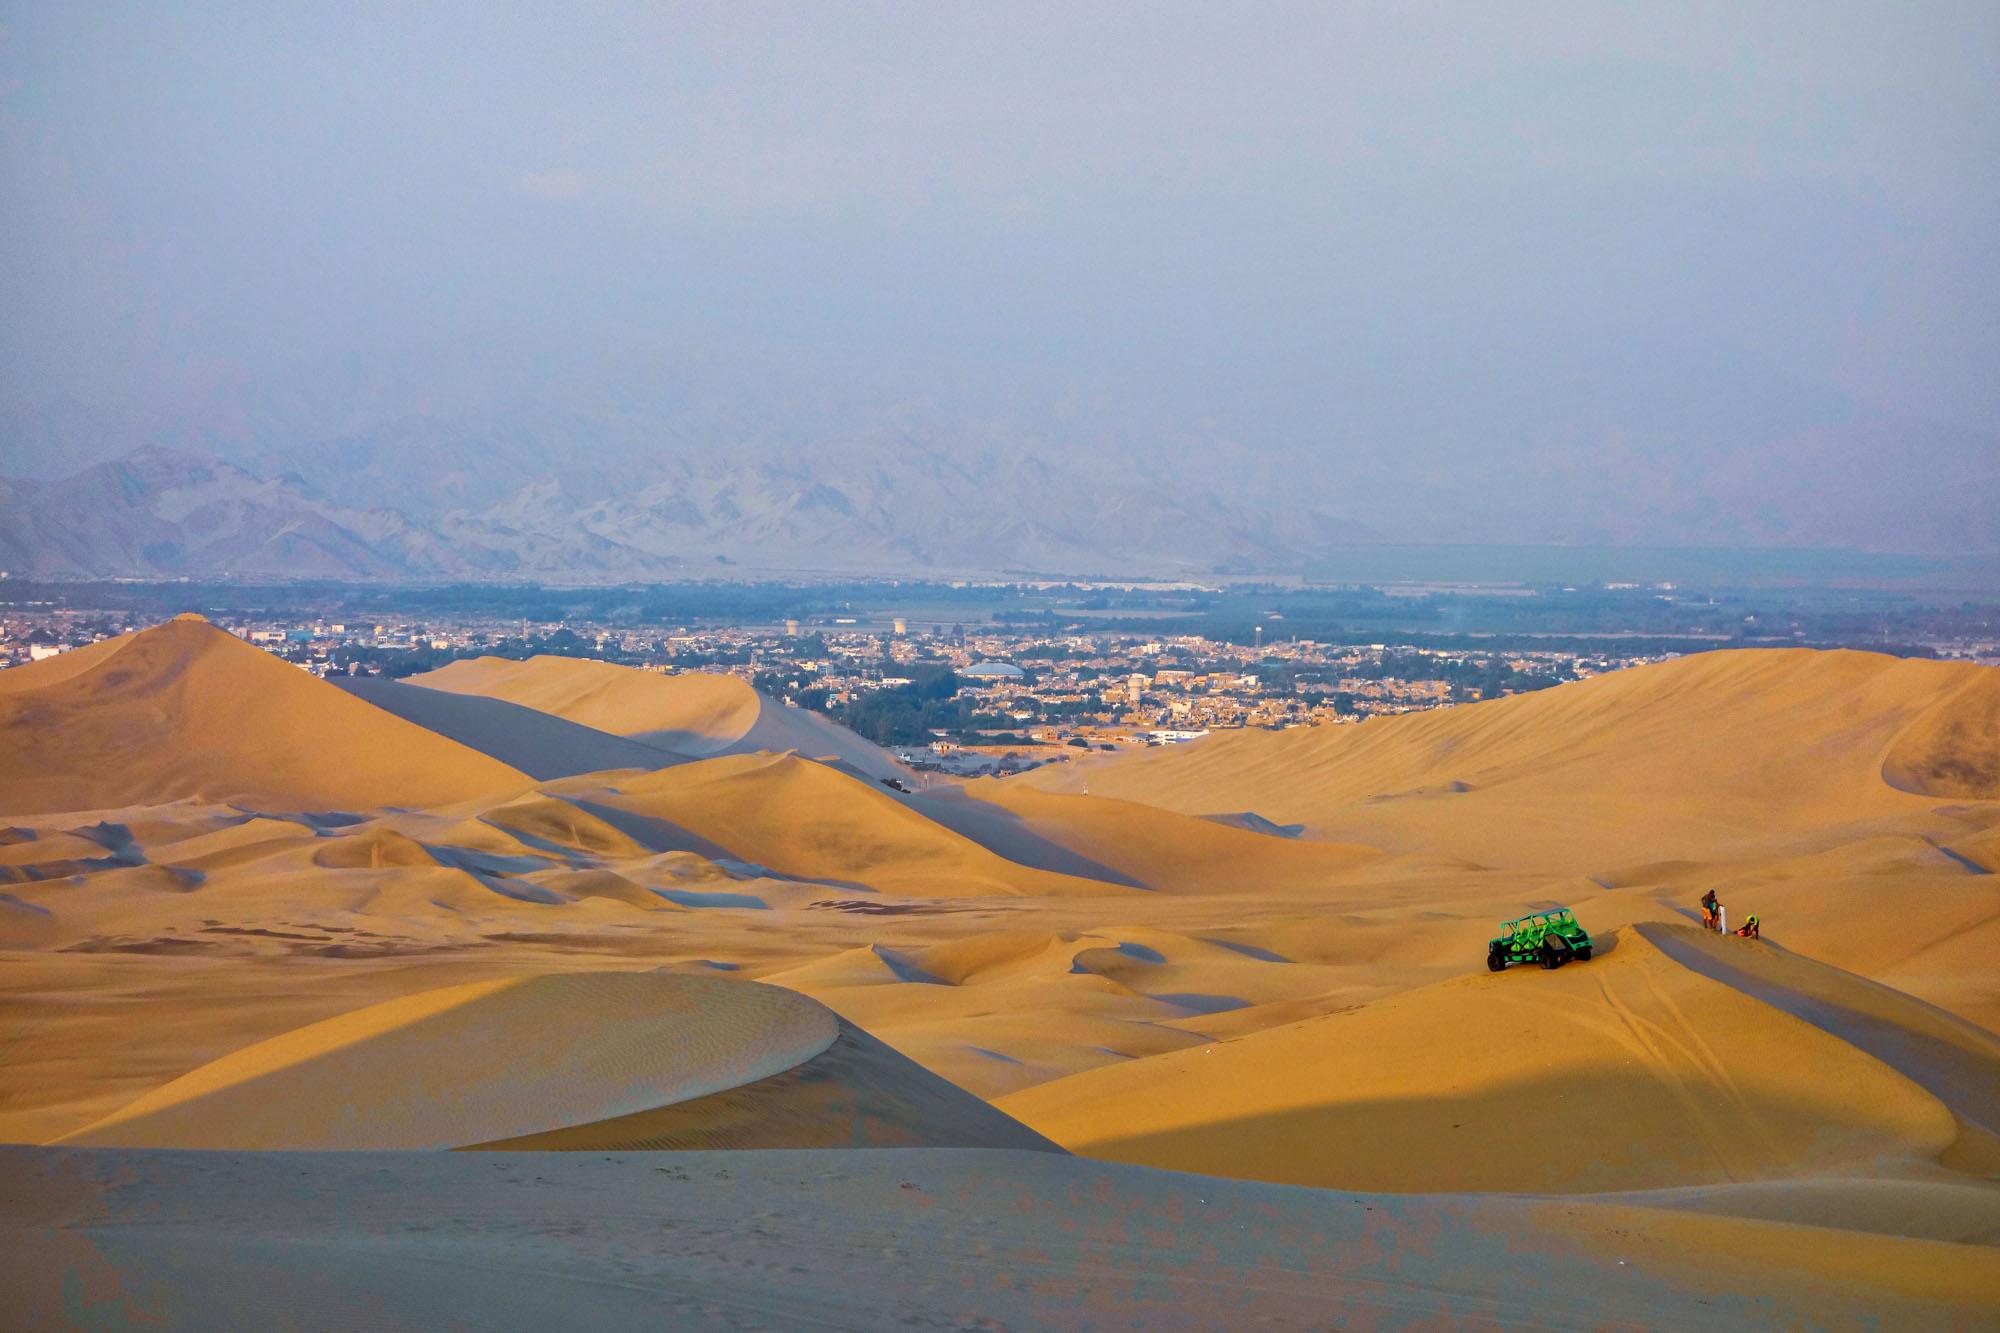 Les dunes de Huacachina - sandboard